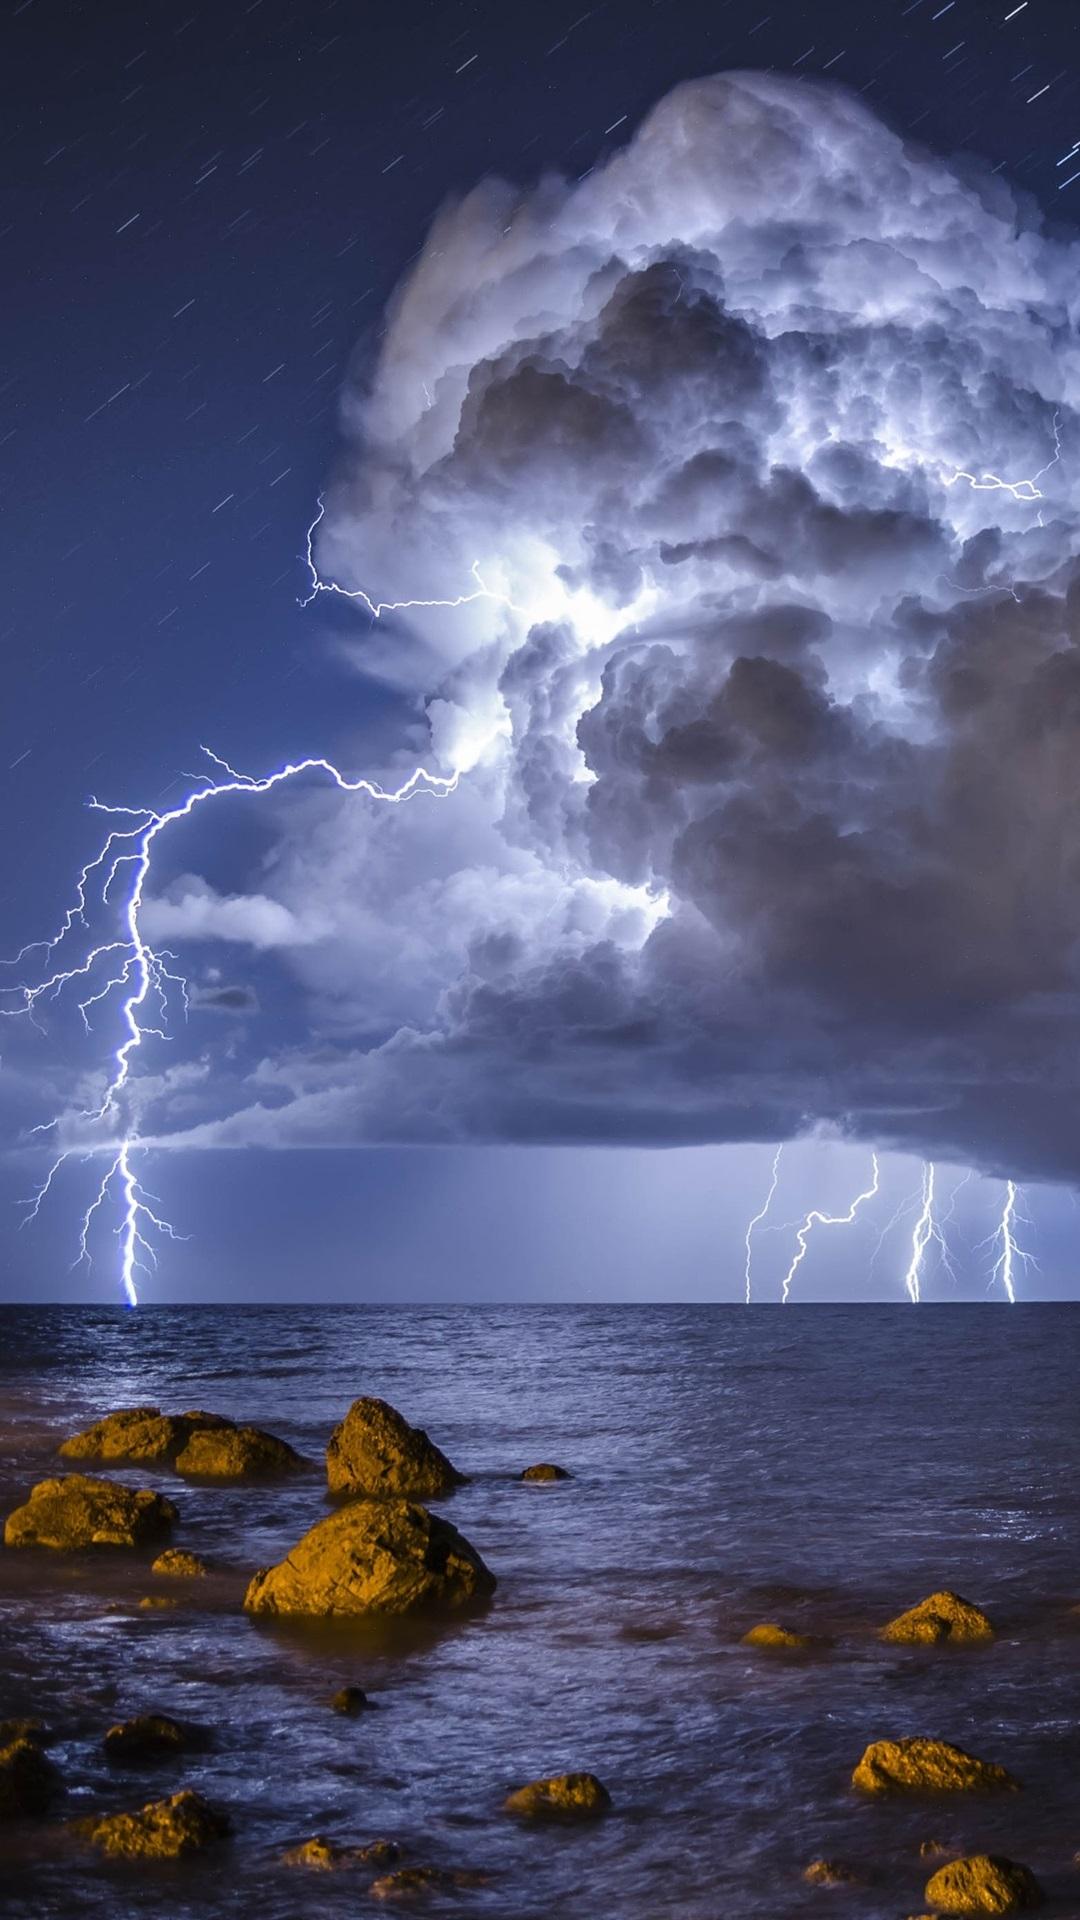 Storm Lightning Sea Stones 1080x1920 Iphone 8 7 6 6s Plus